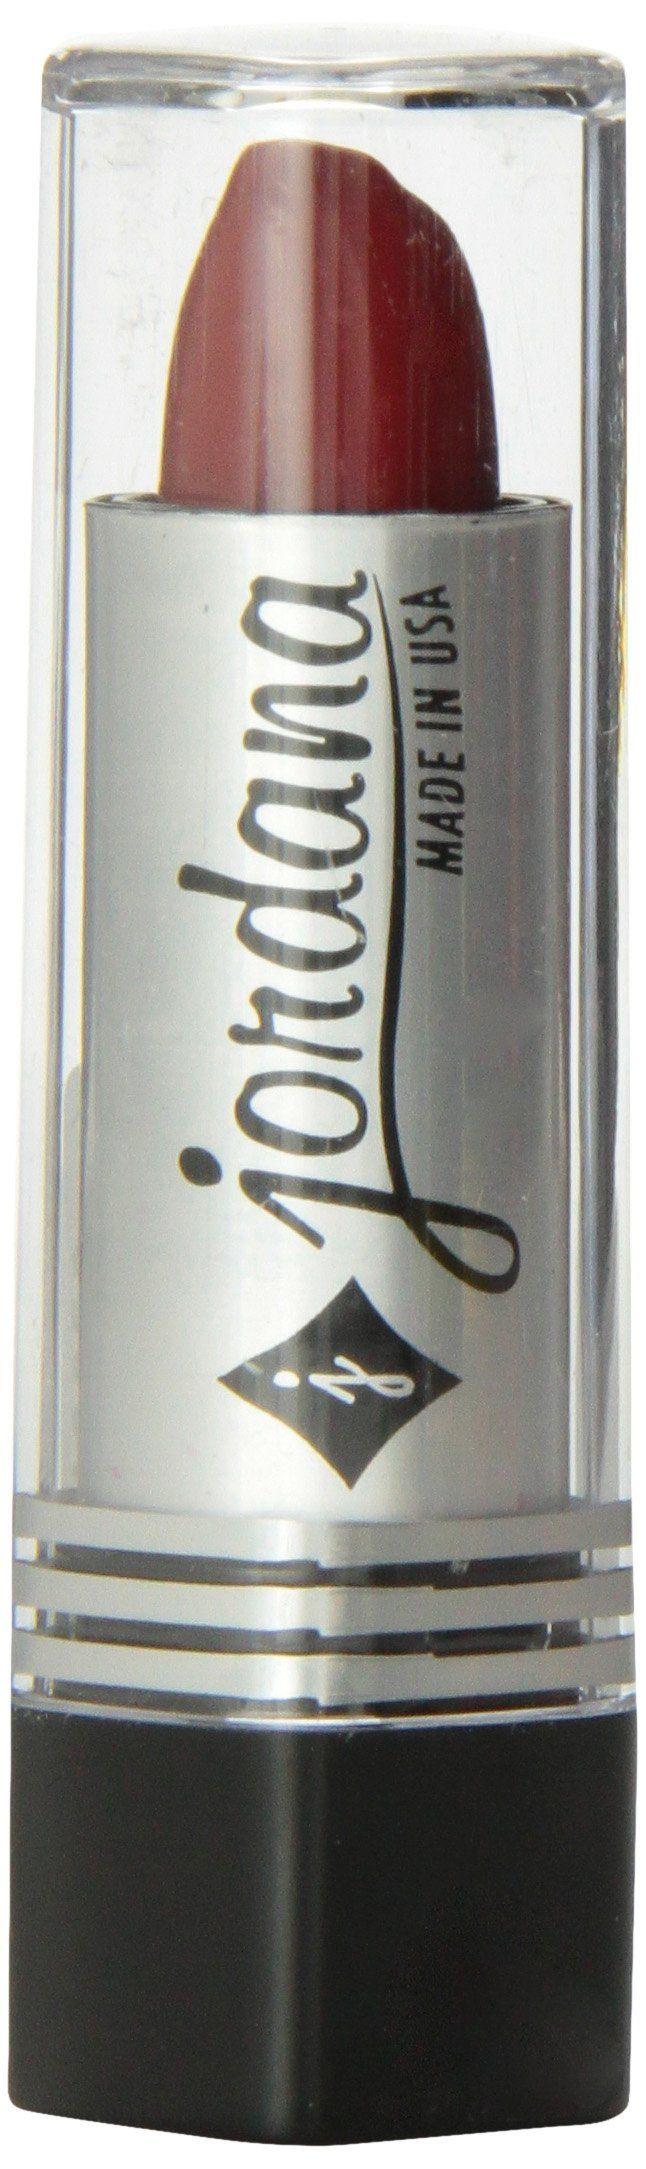 Jordana Lipstick 026 Garnet. Quality lipstick. Great Value!.